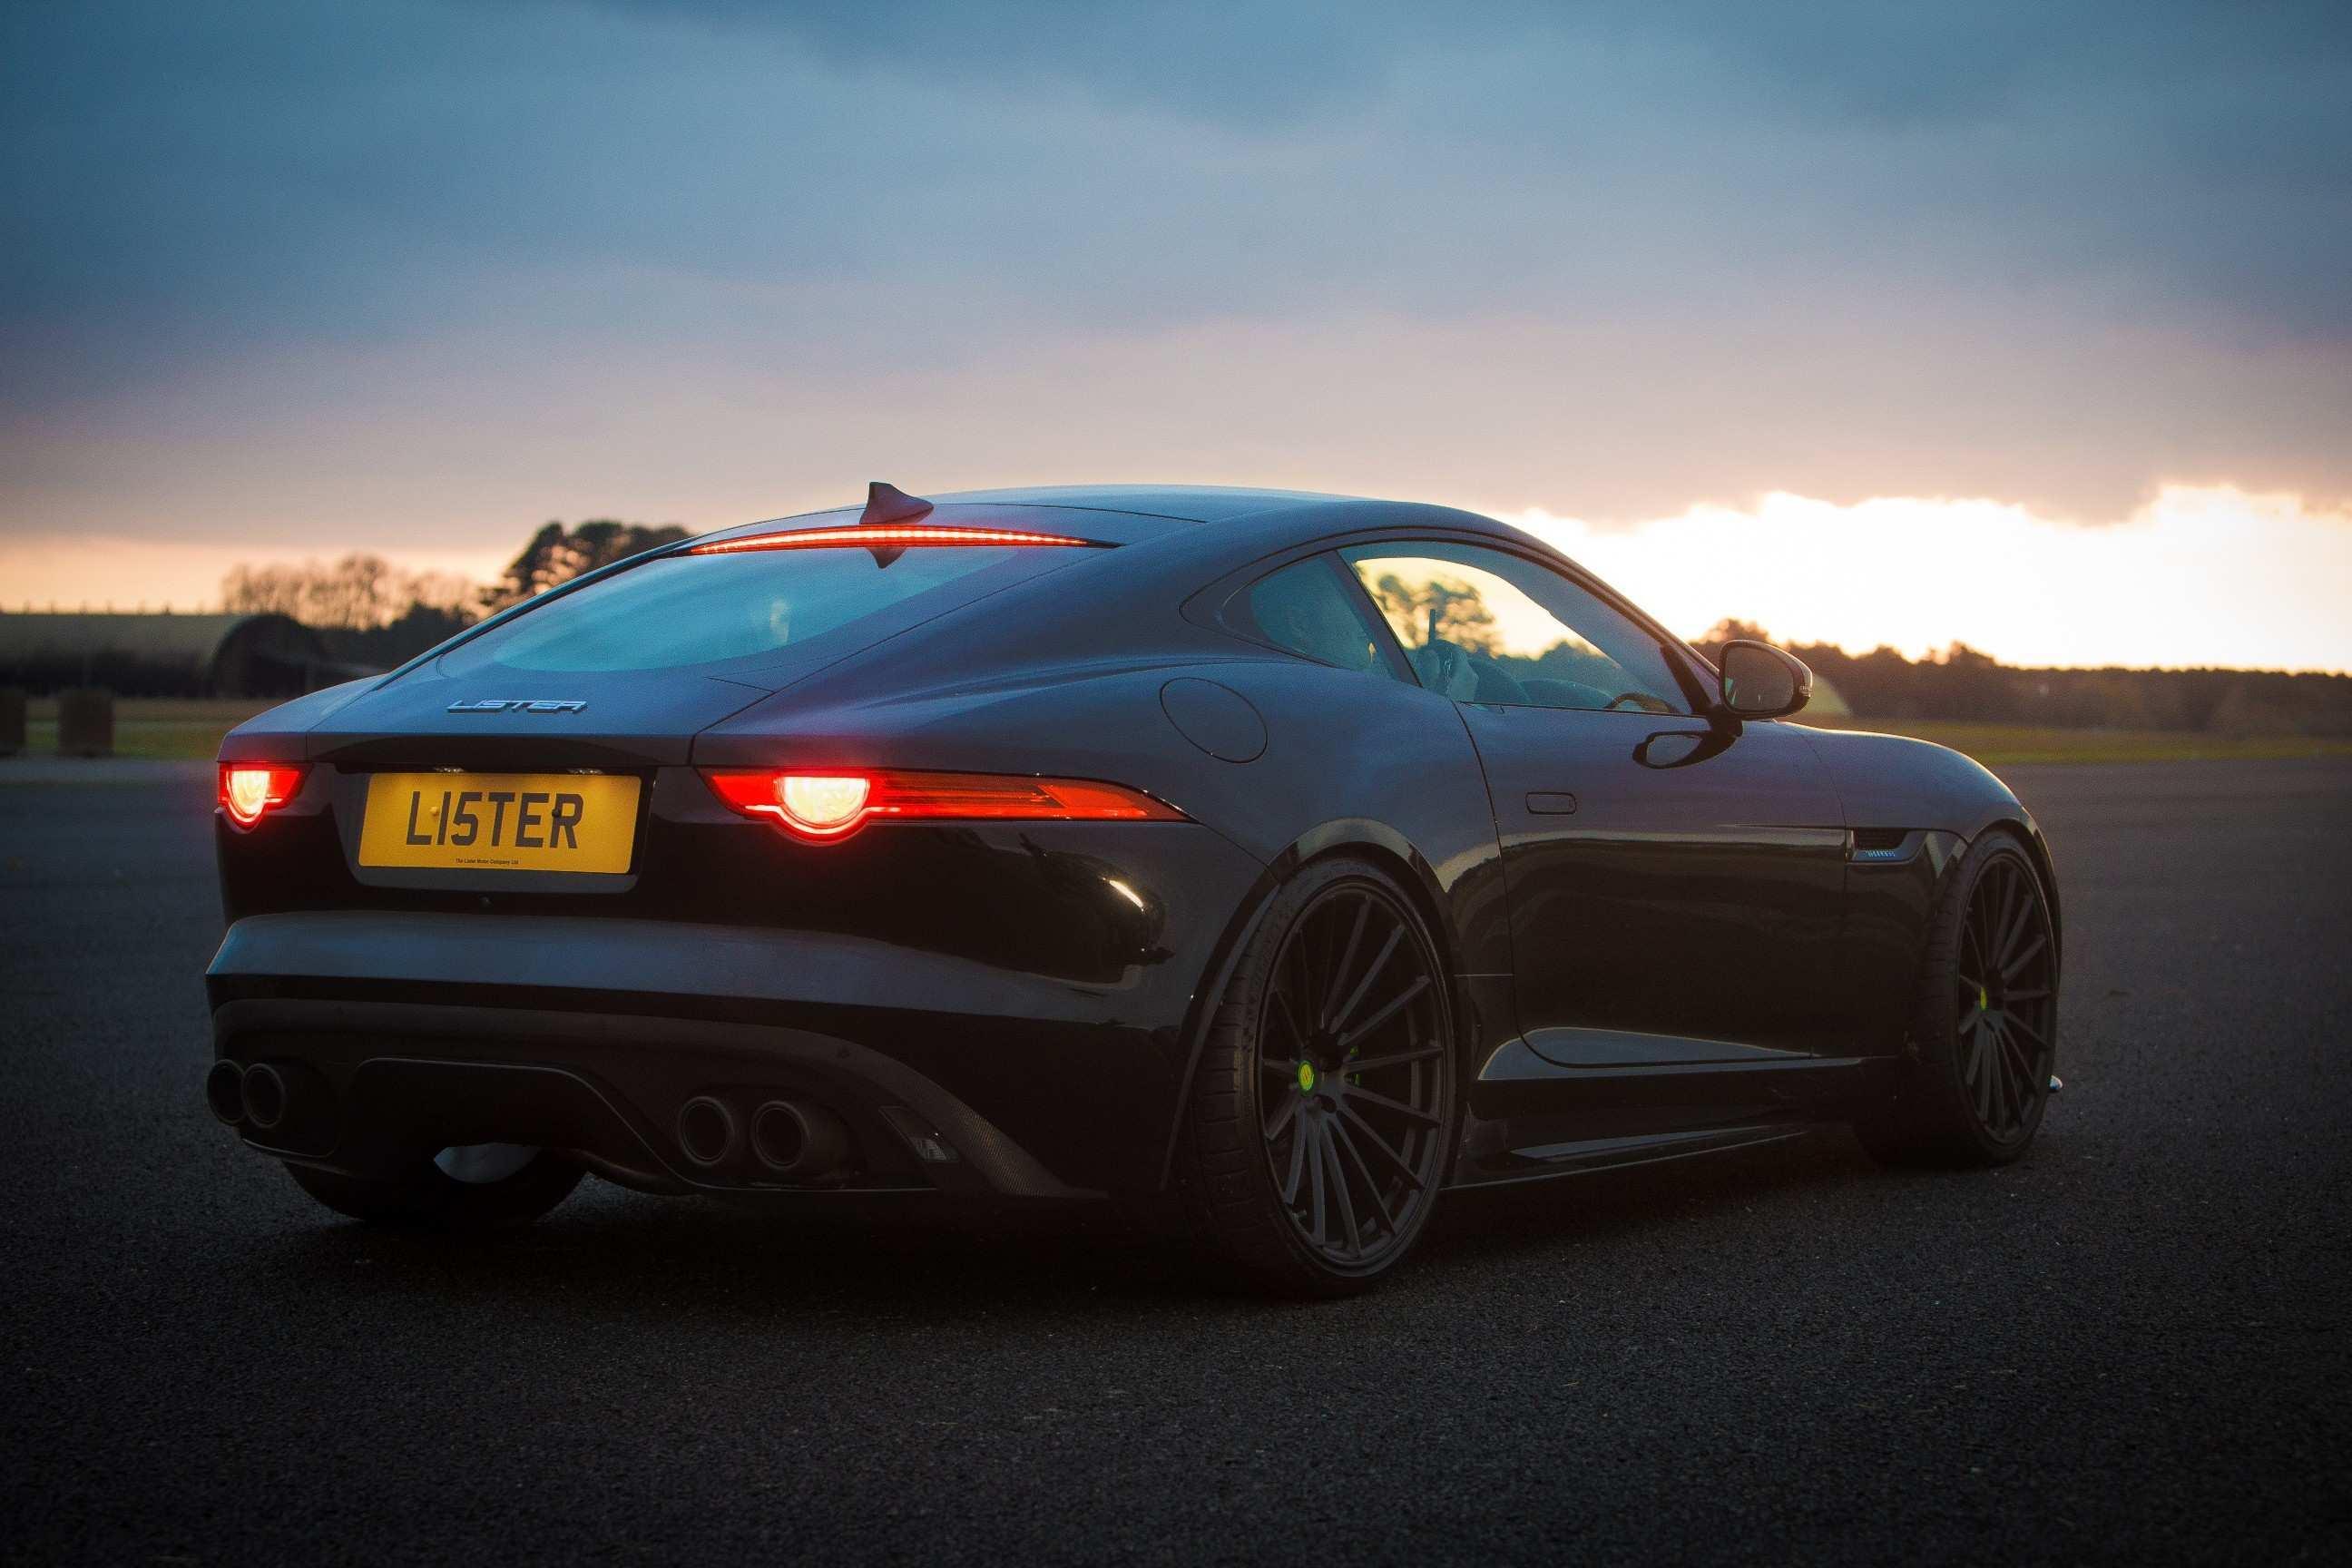 42 All New Jaguar Neuheiten Bis 2020 Model for Jaguar Neuheiten Bis 2020